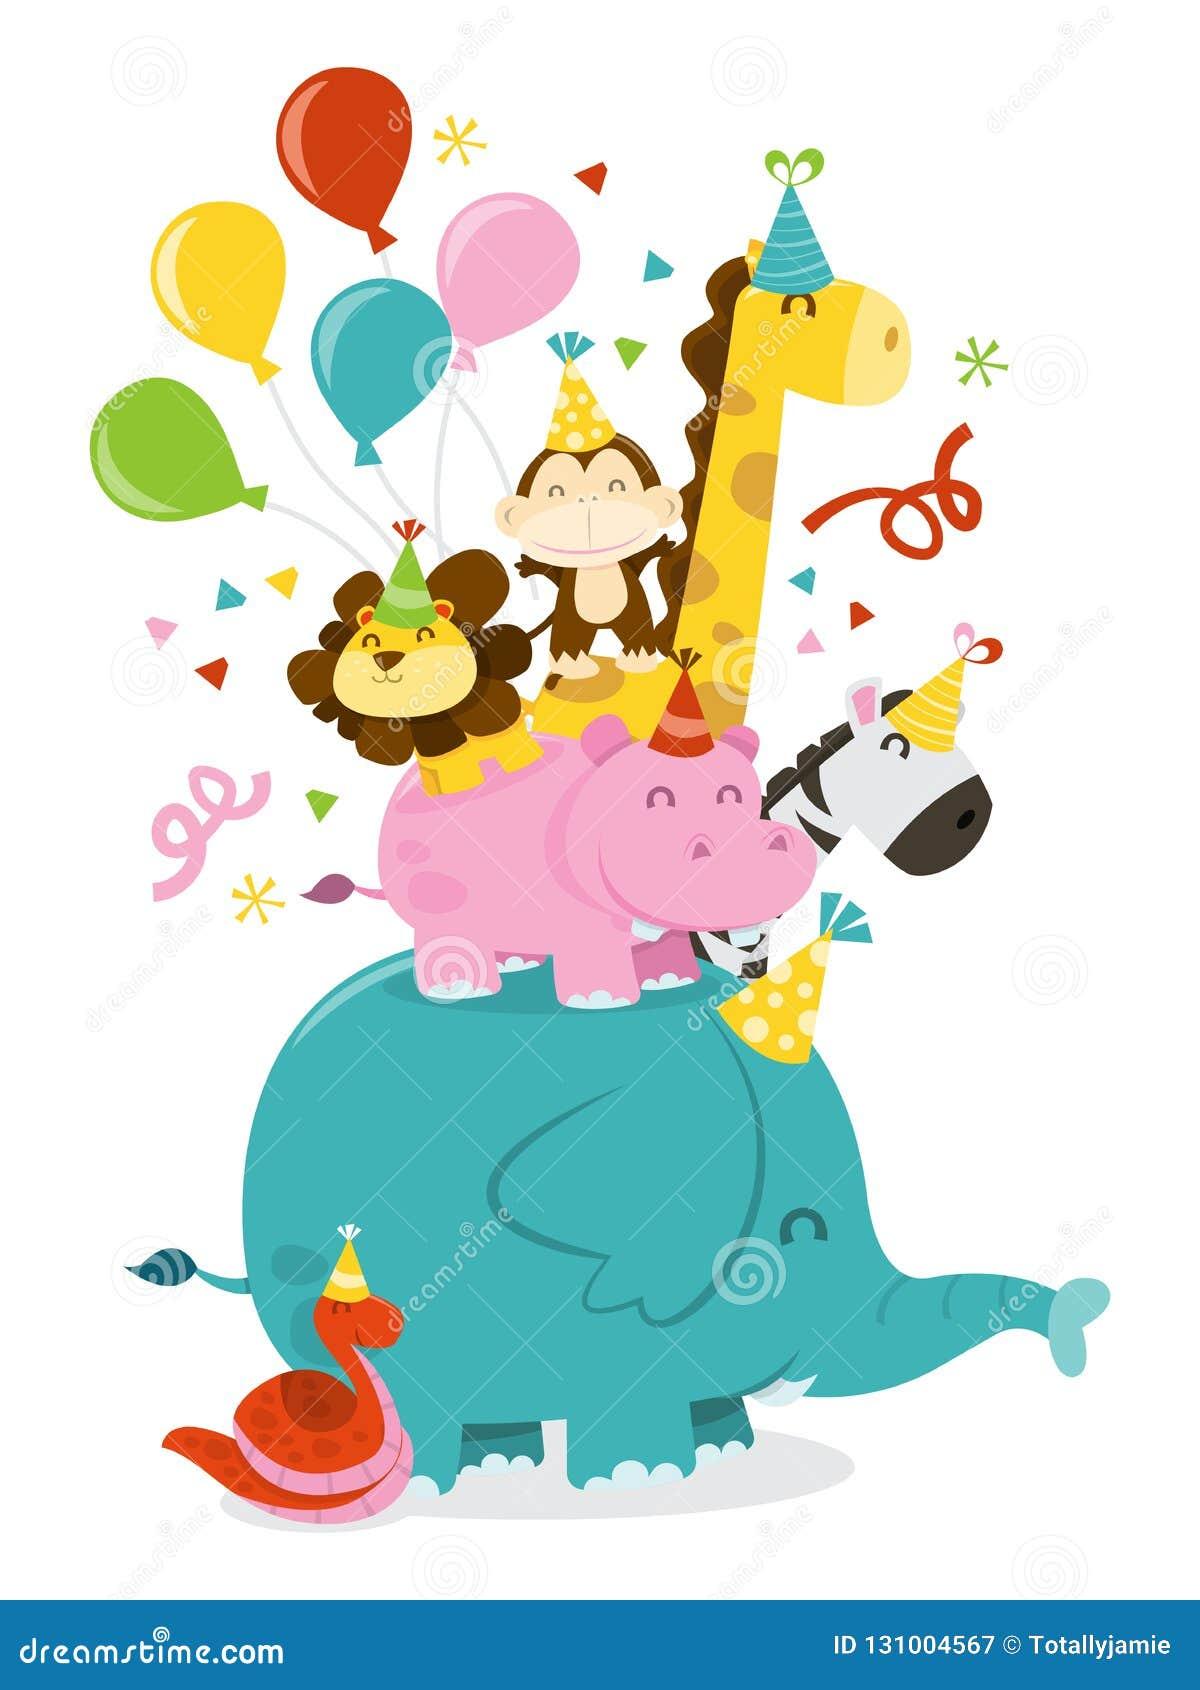 Happy Jungle Animals Party Celebration Stack Stock Illustration Illustration Of Celebration Vector 131004567